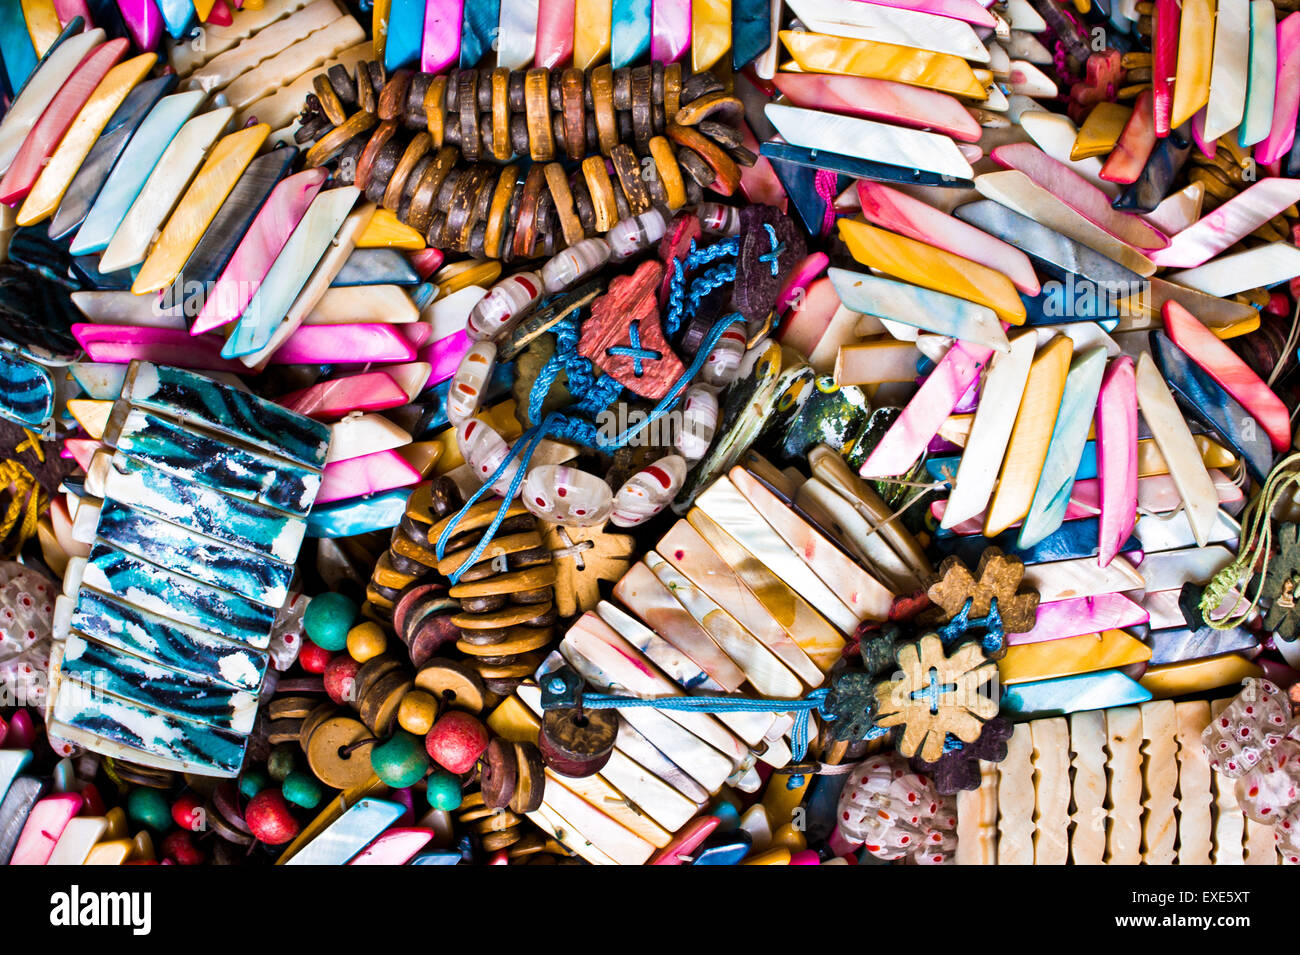 Souvenir bracelets and pendants at a Turkish market Stock Photo